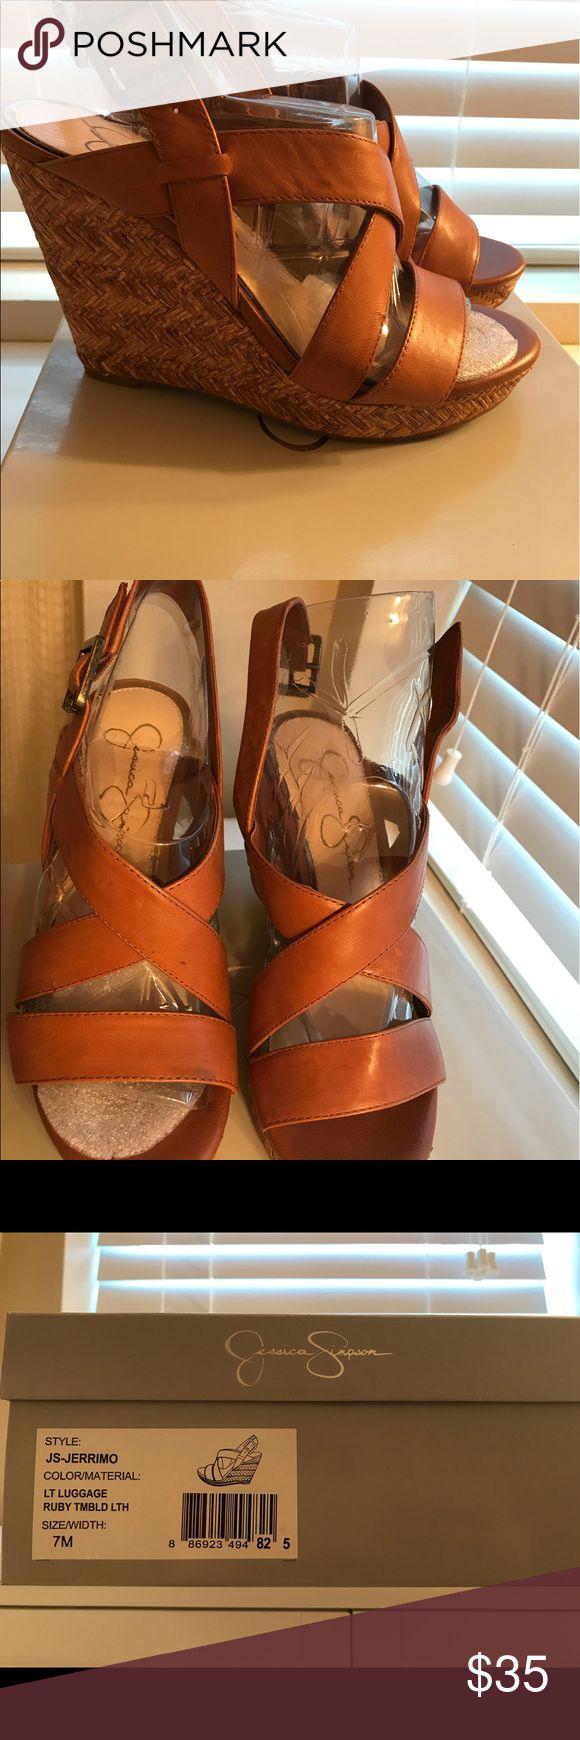 Jessica Simpson sandals Brand new Jessica Simpson sandals, in perfect condition. Jessica Simpson Shoes Espadrilles